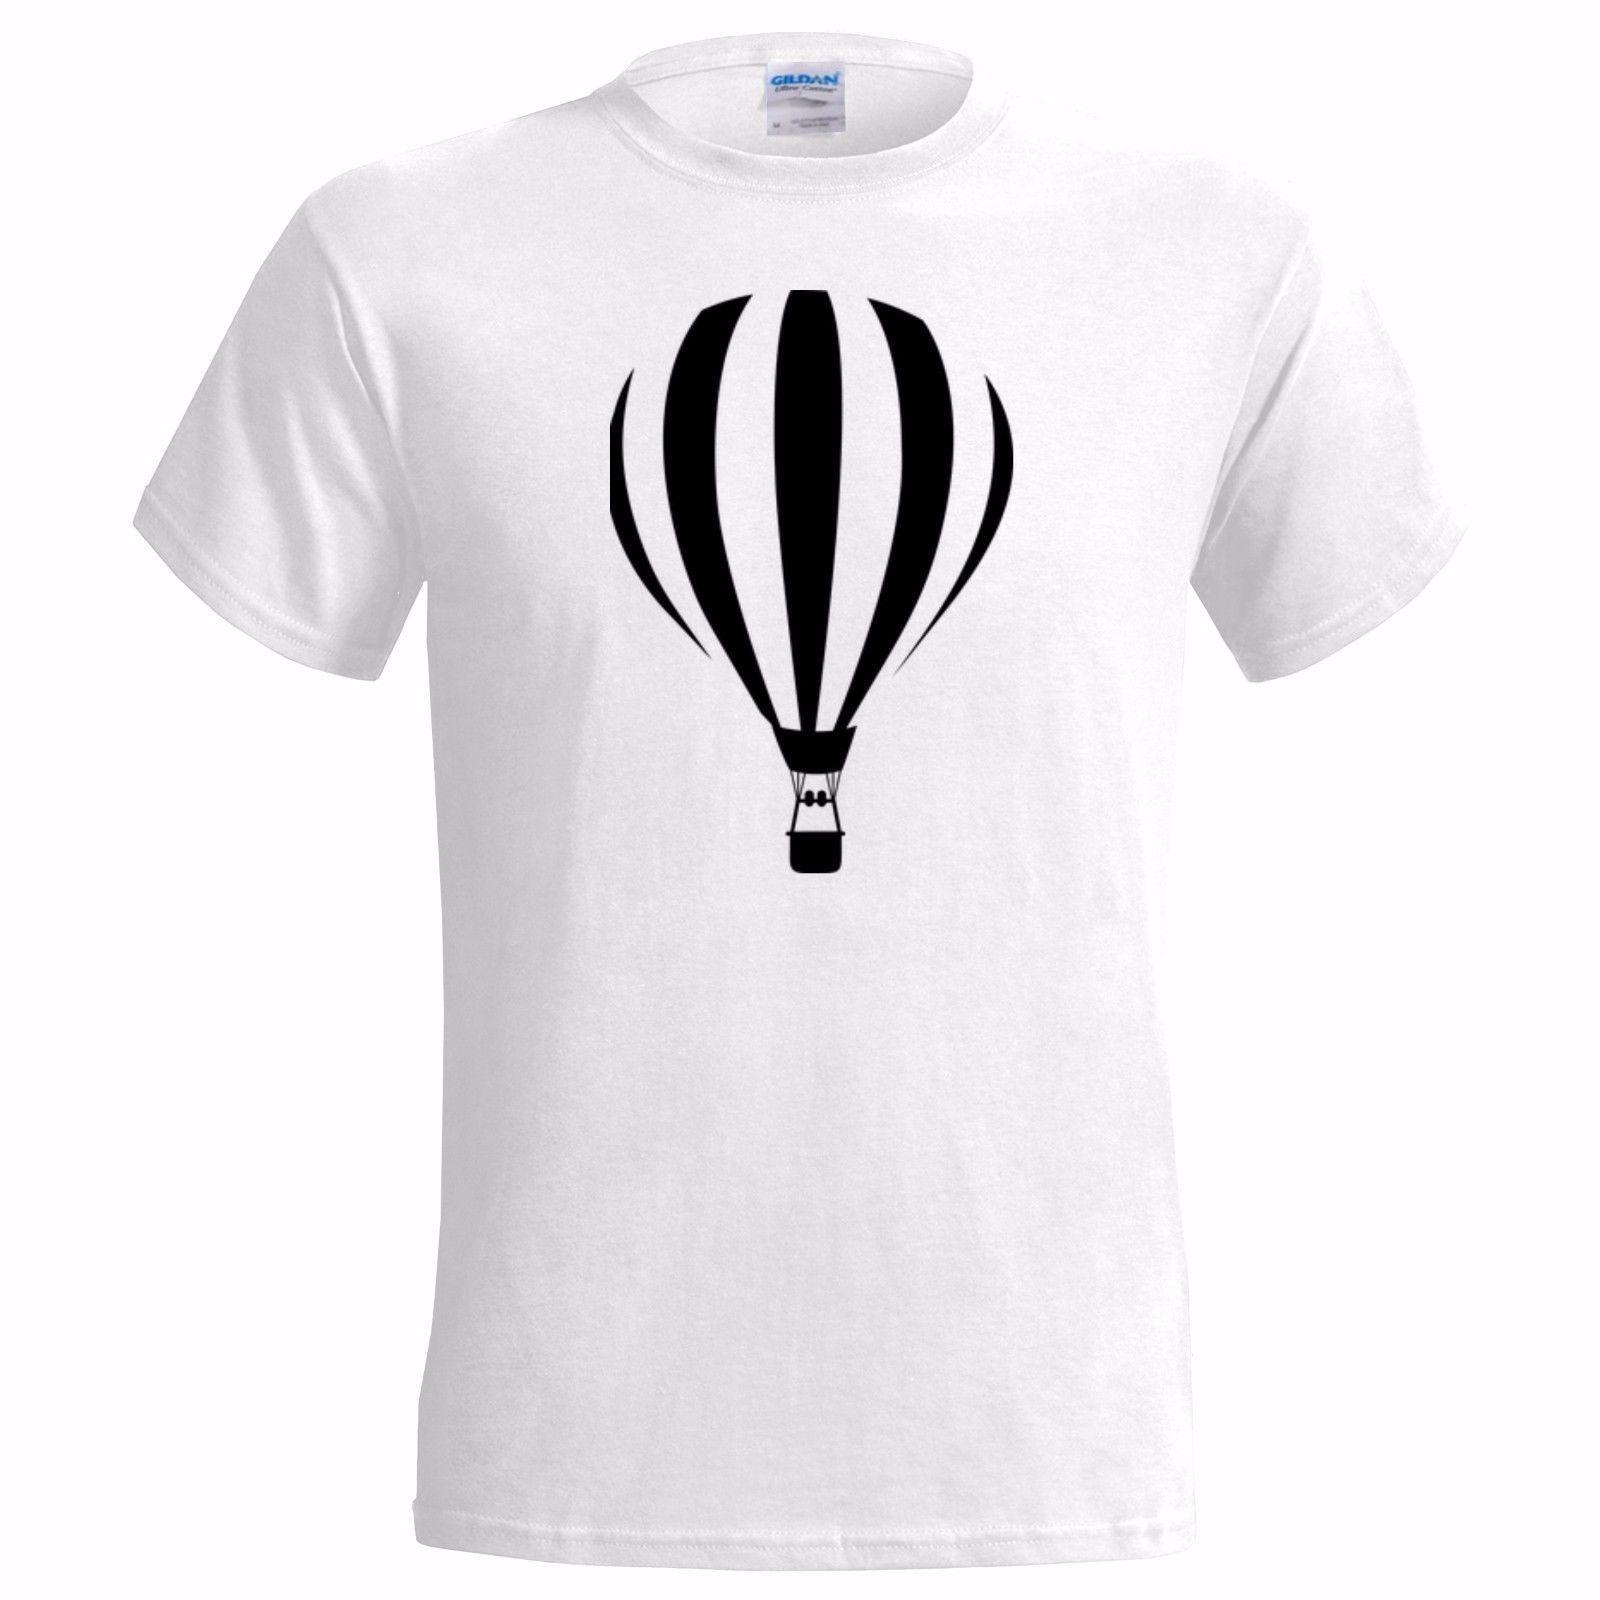 1411953c75680 AIR BALLOON DESIGN MENS T SHIRT FLIGHT HOT GIFT PRESENT BALLOONING  MONTGOLFIERFunny free shipping Unisex Casual top